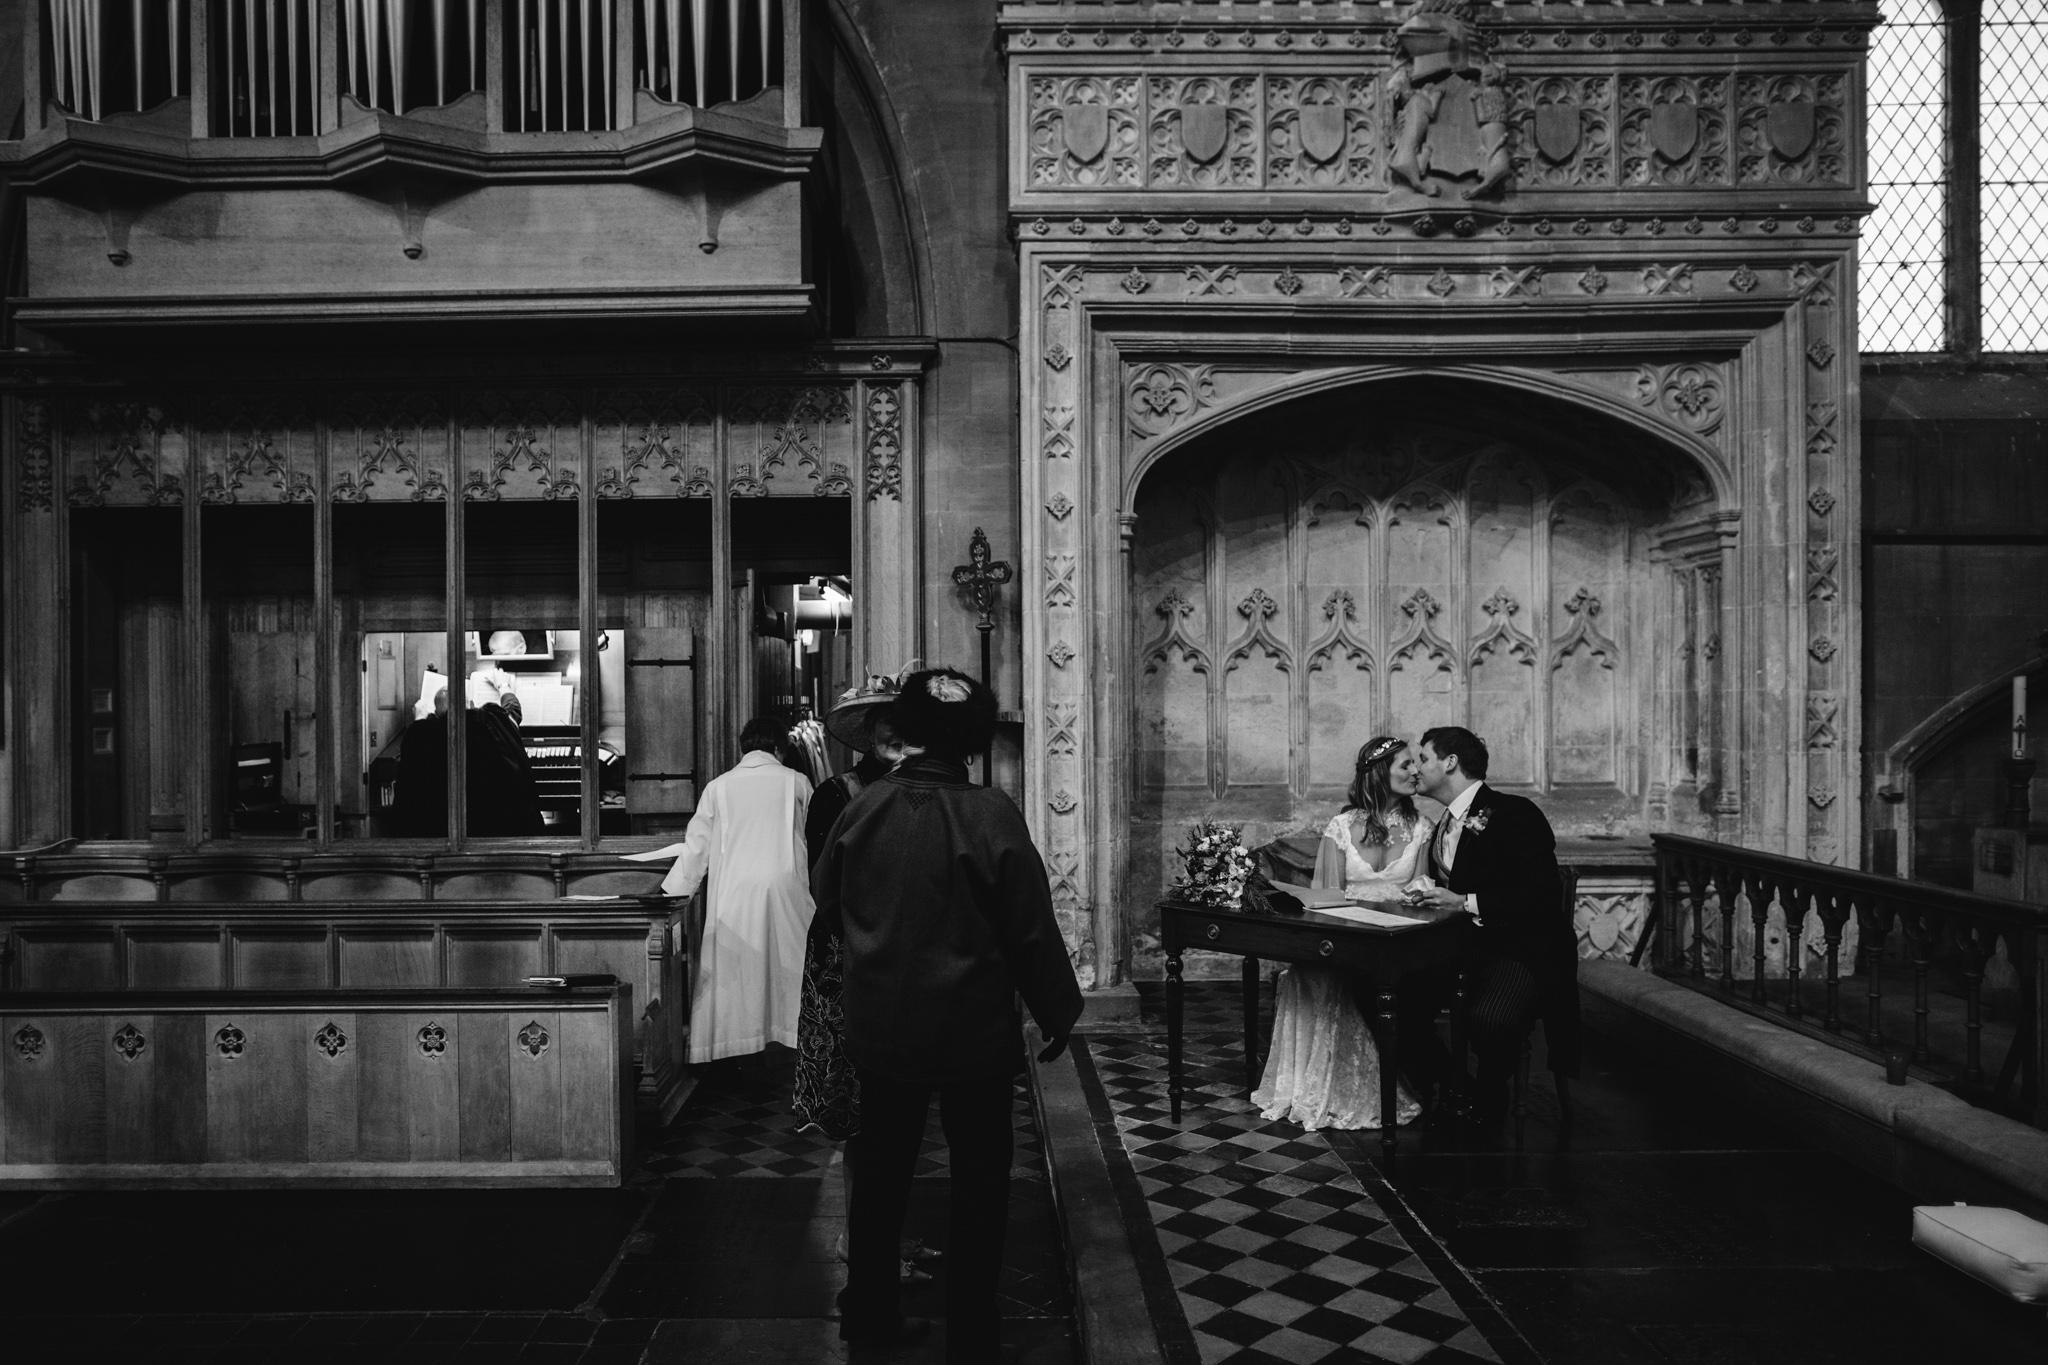 derbyshire-wedding-photographer-camera-hannah-10.jpg